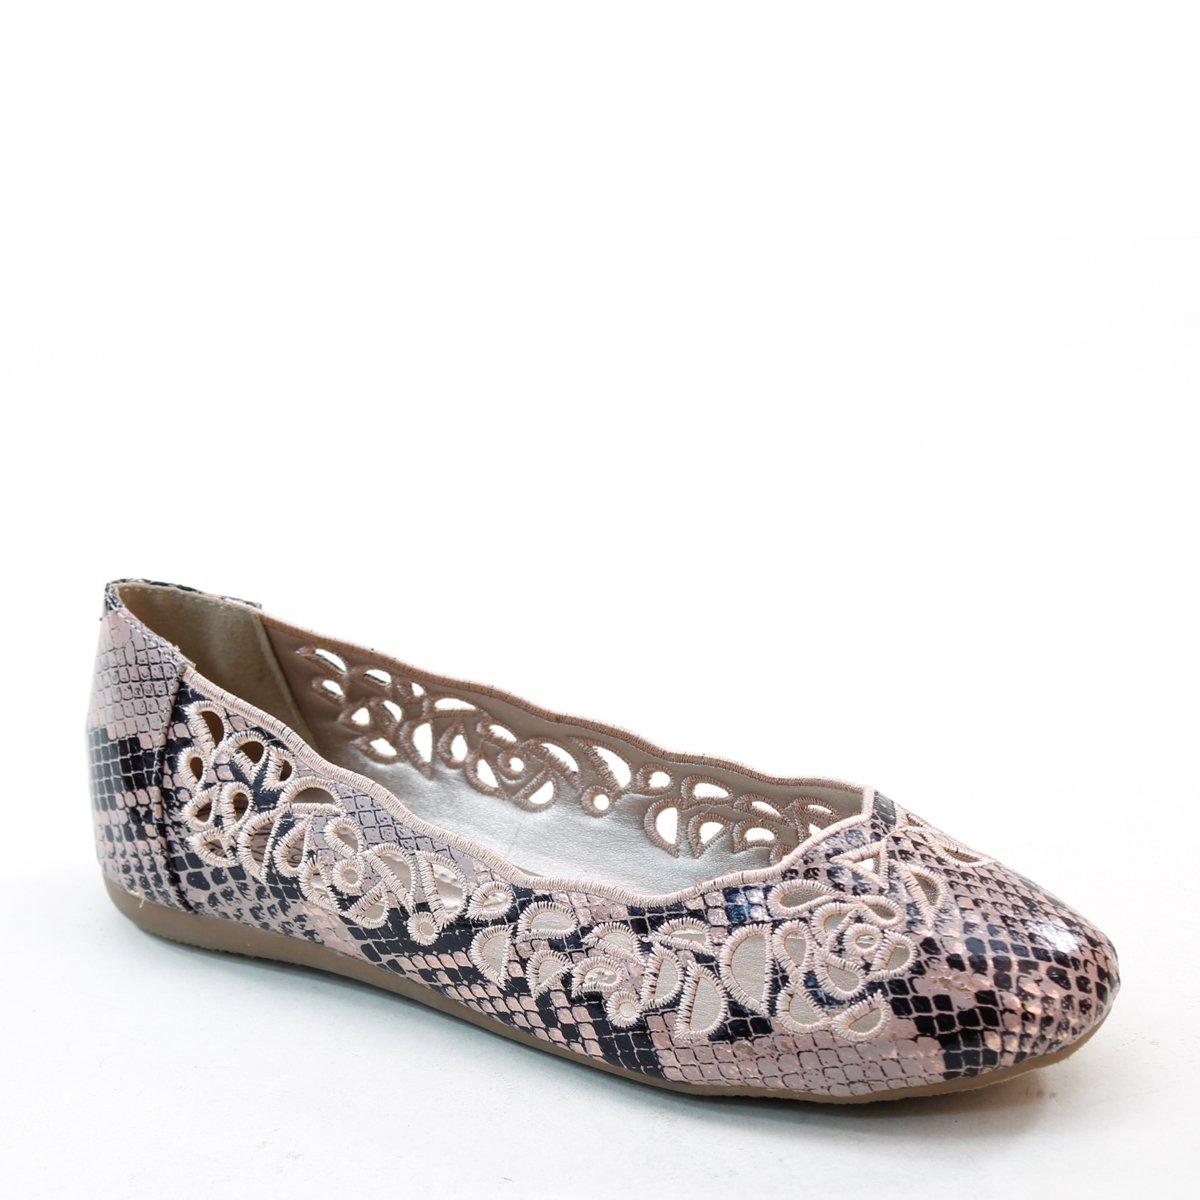 Brand New Brieten Women's Hollow Flower Snake Skin Pattern Style Round Toe Flats B00WSDFU8E 9 B(M) US|Peach